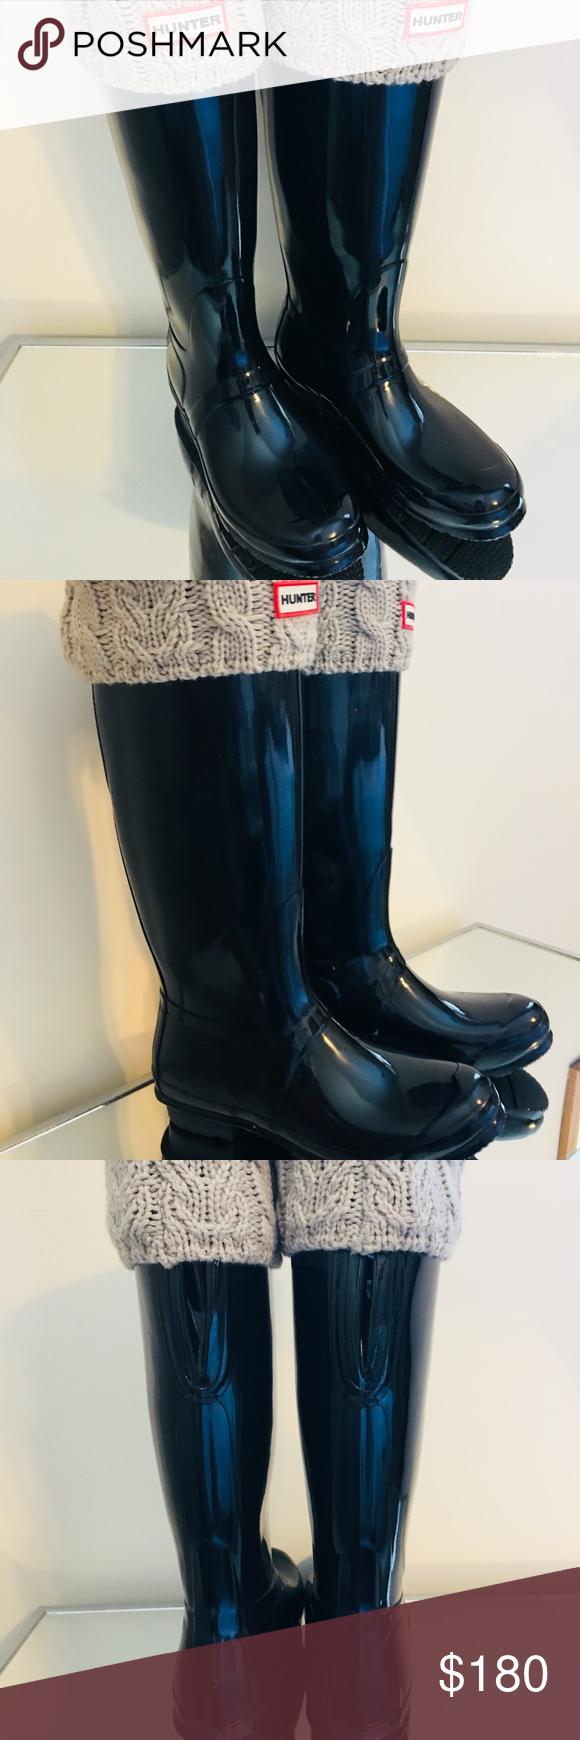 ccdead82c744 Hunter Boots w  Socks Very gently worn tall